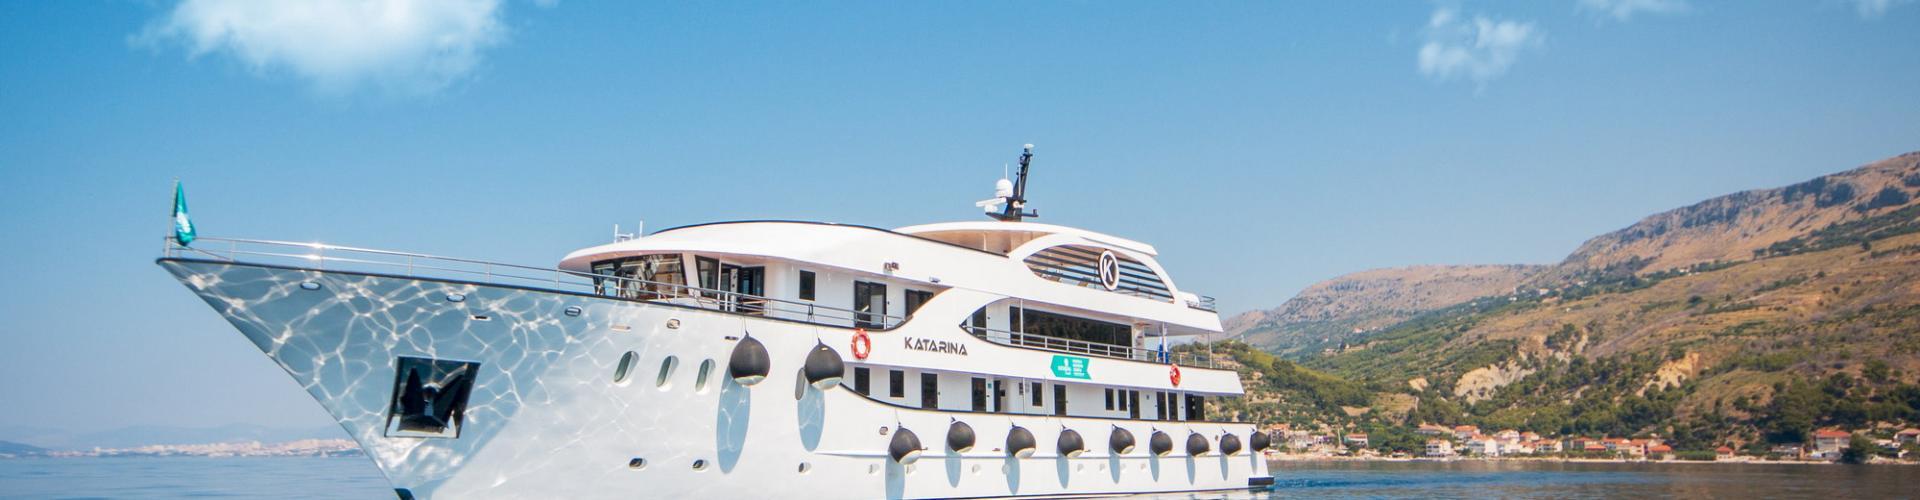 motor boat Deluxe cruiser MV Katarina